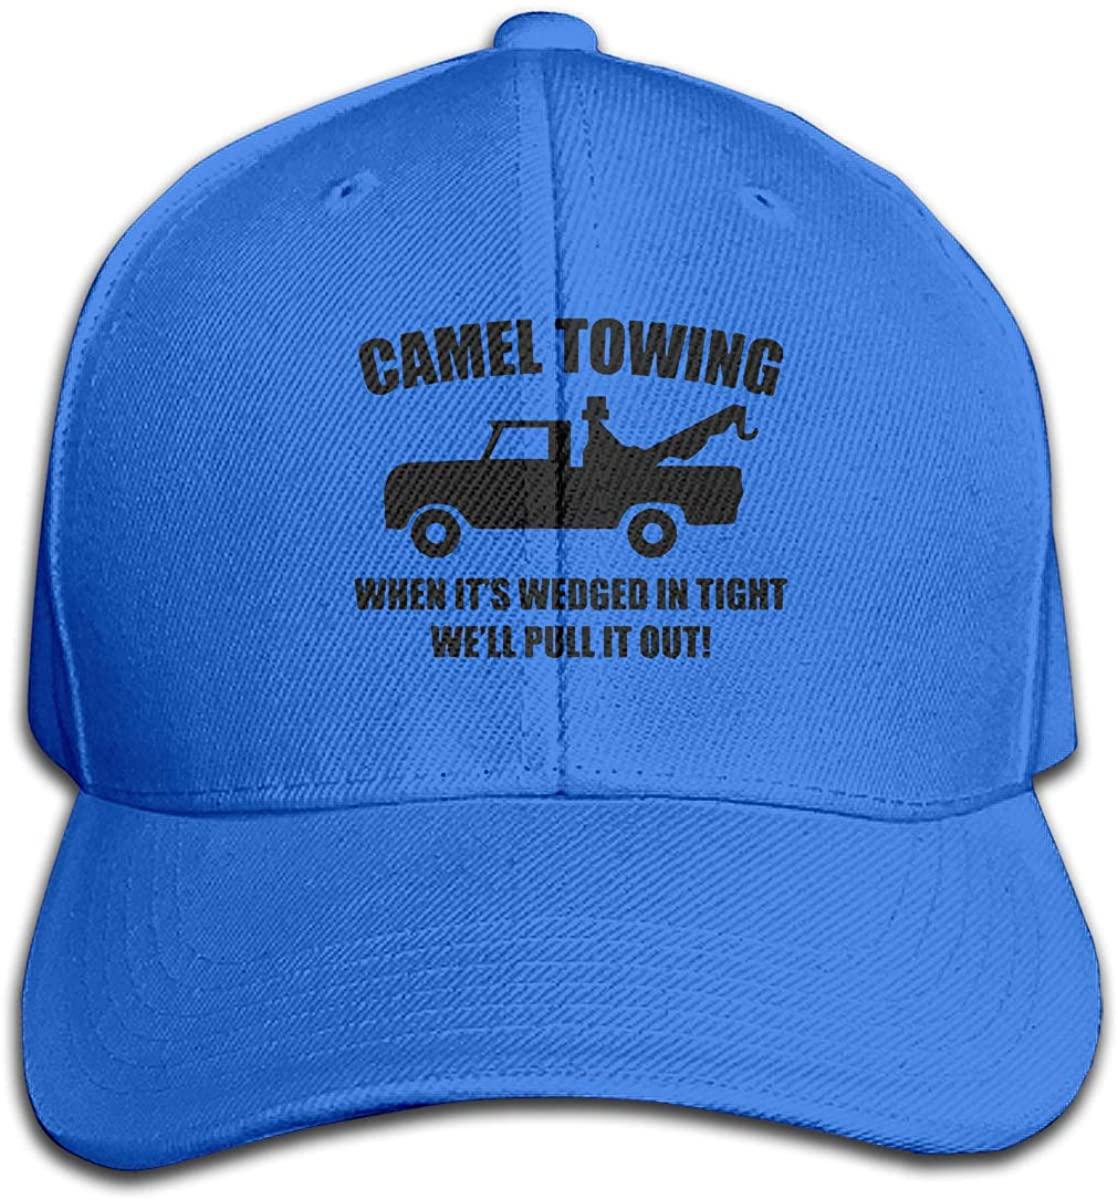 Luomendi Baseball Caps Camel Towing Unisex Snapback Hat Adjustable Visor Cap Black